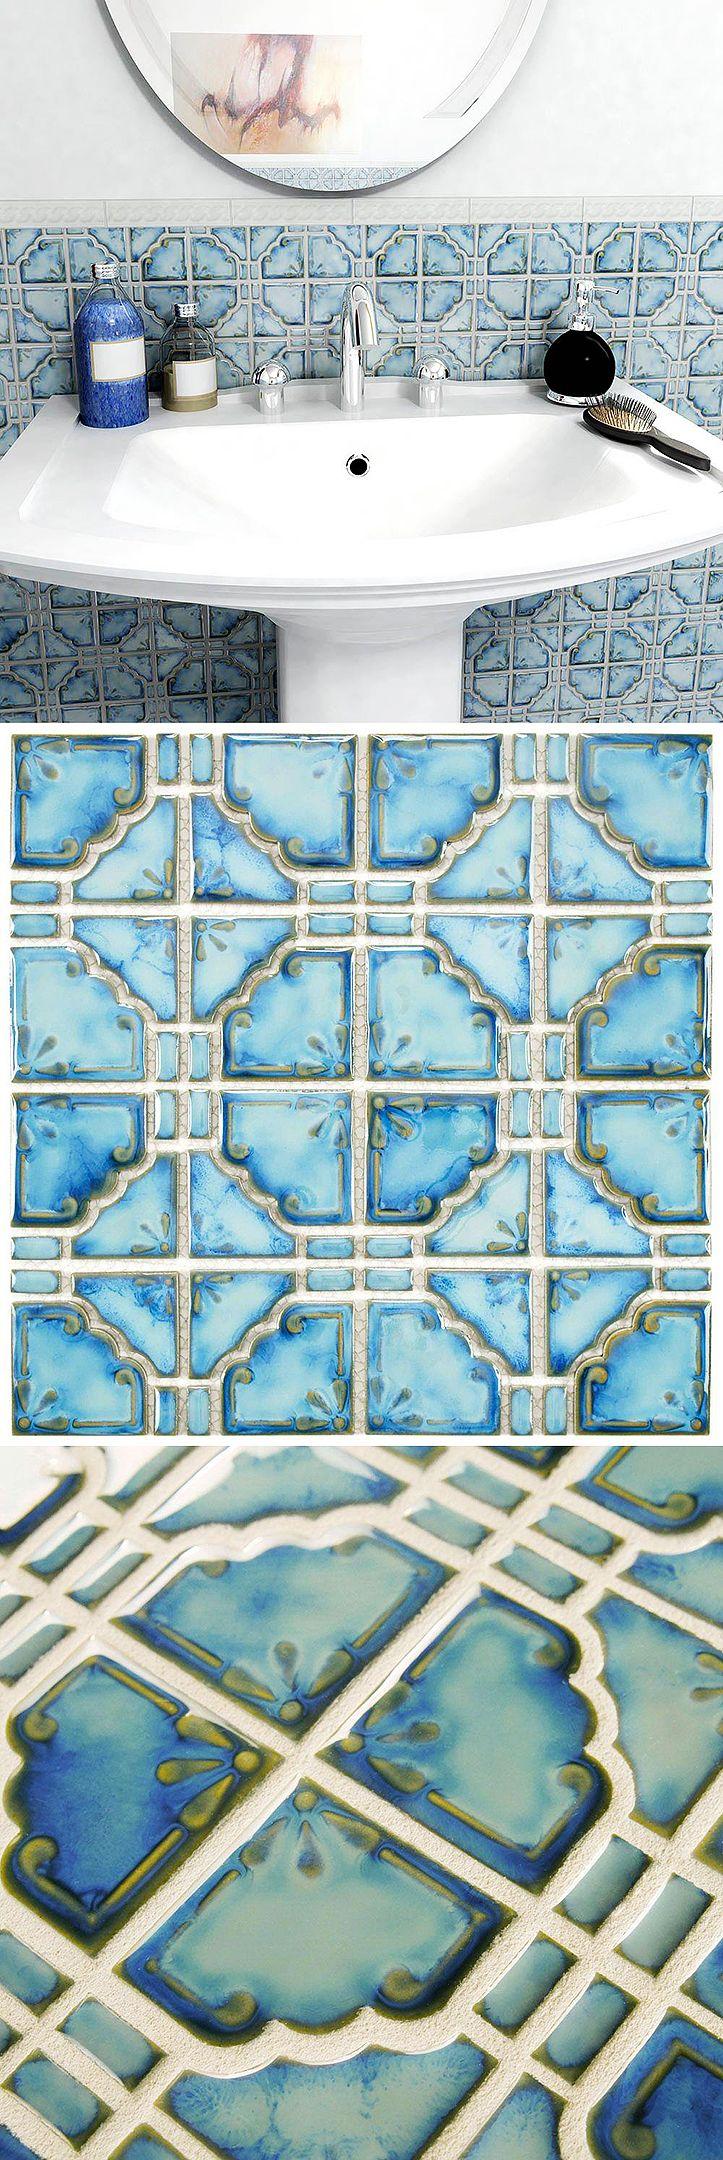 Mosaic floor tiles bathroom - Merola Tile Moonbeam Diva Blue 11 3 4 In X 11 3 4 In X 7 Mm Porcelain Mosaic Tile